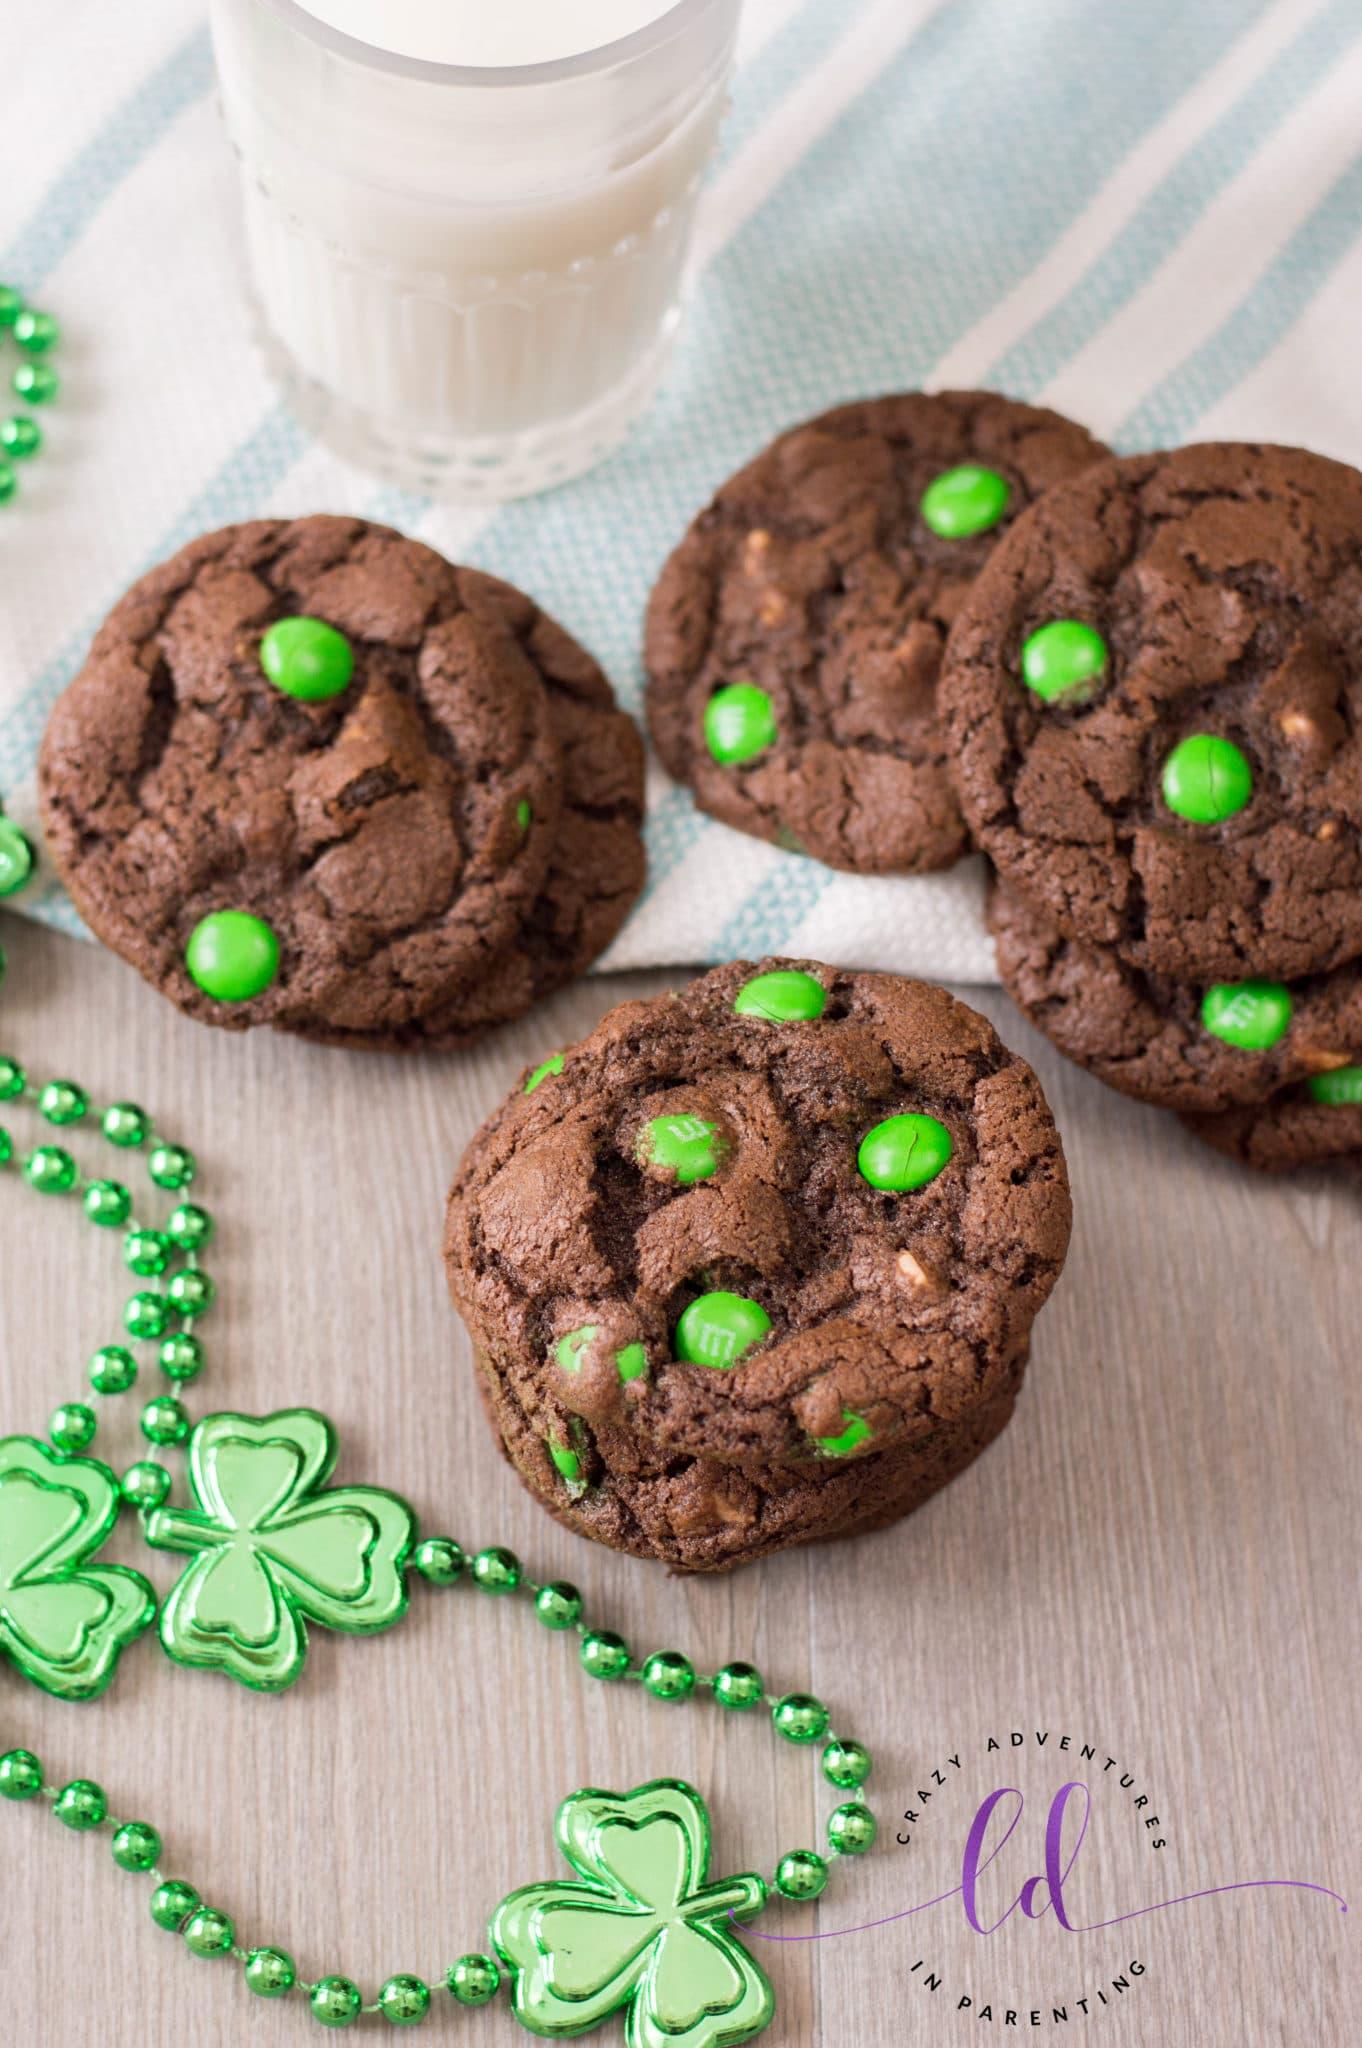 St Patricks Day Chocolate Cookies